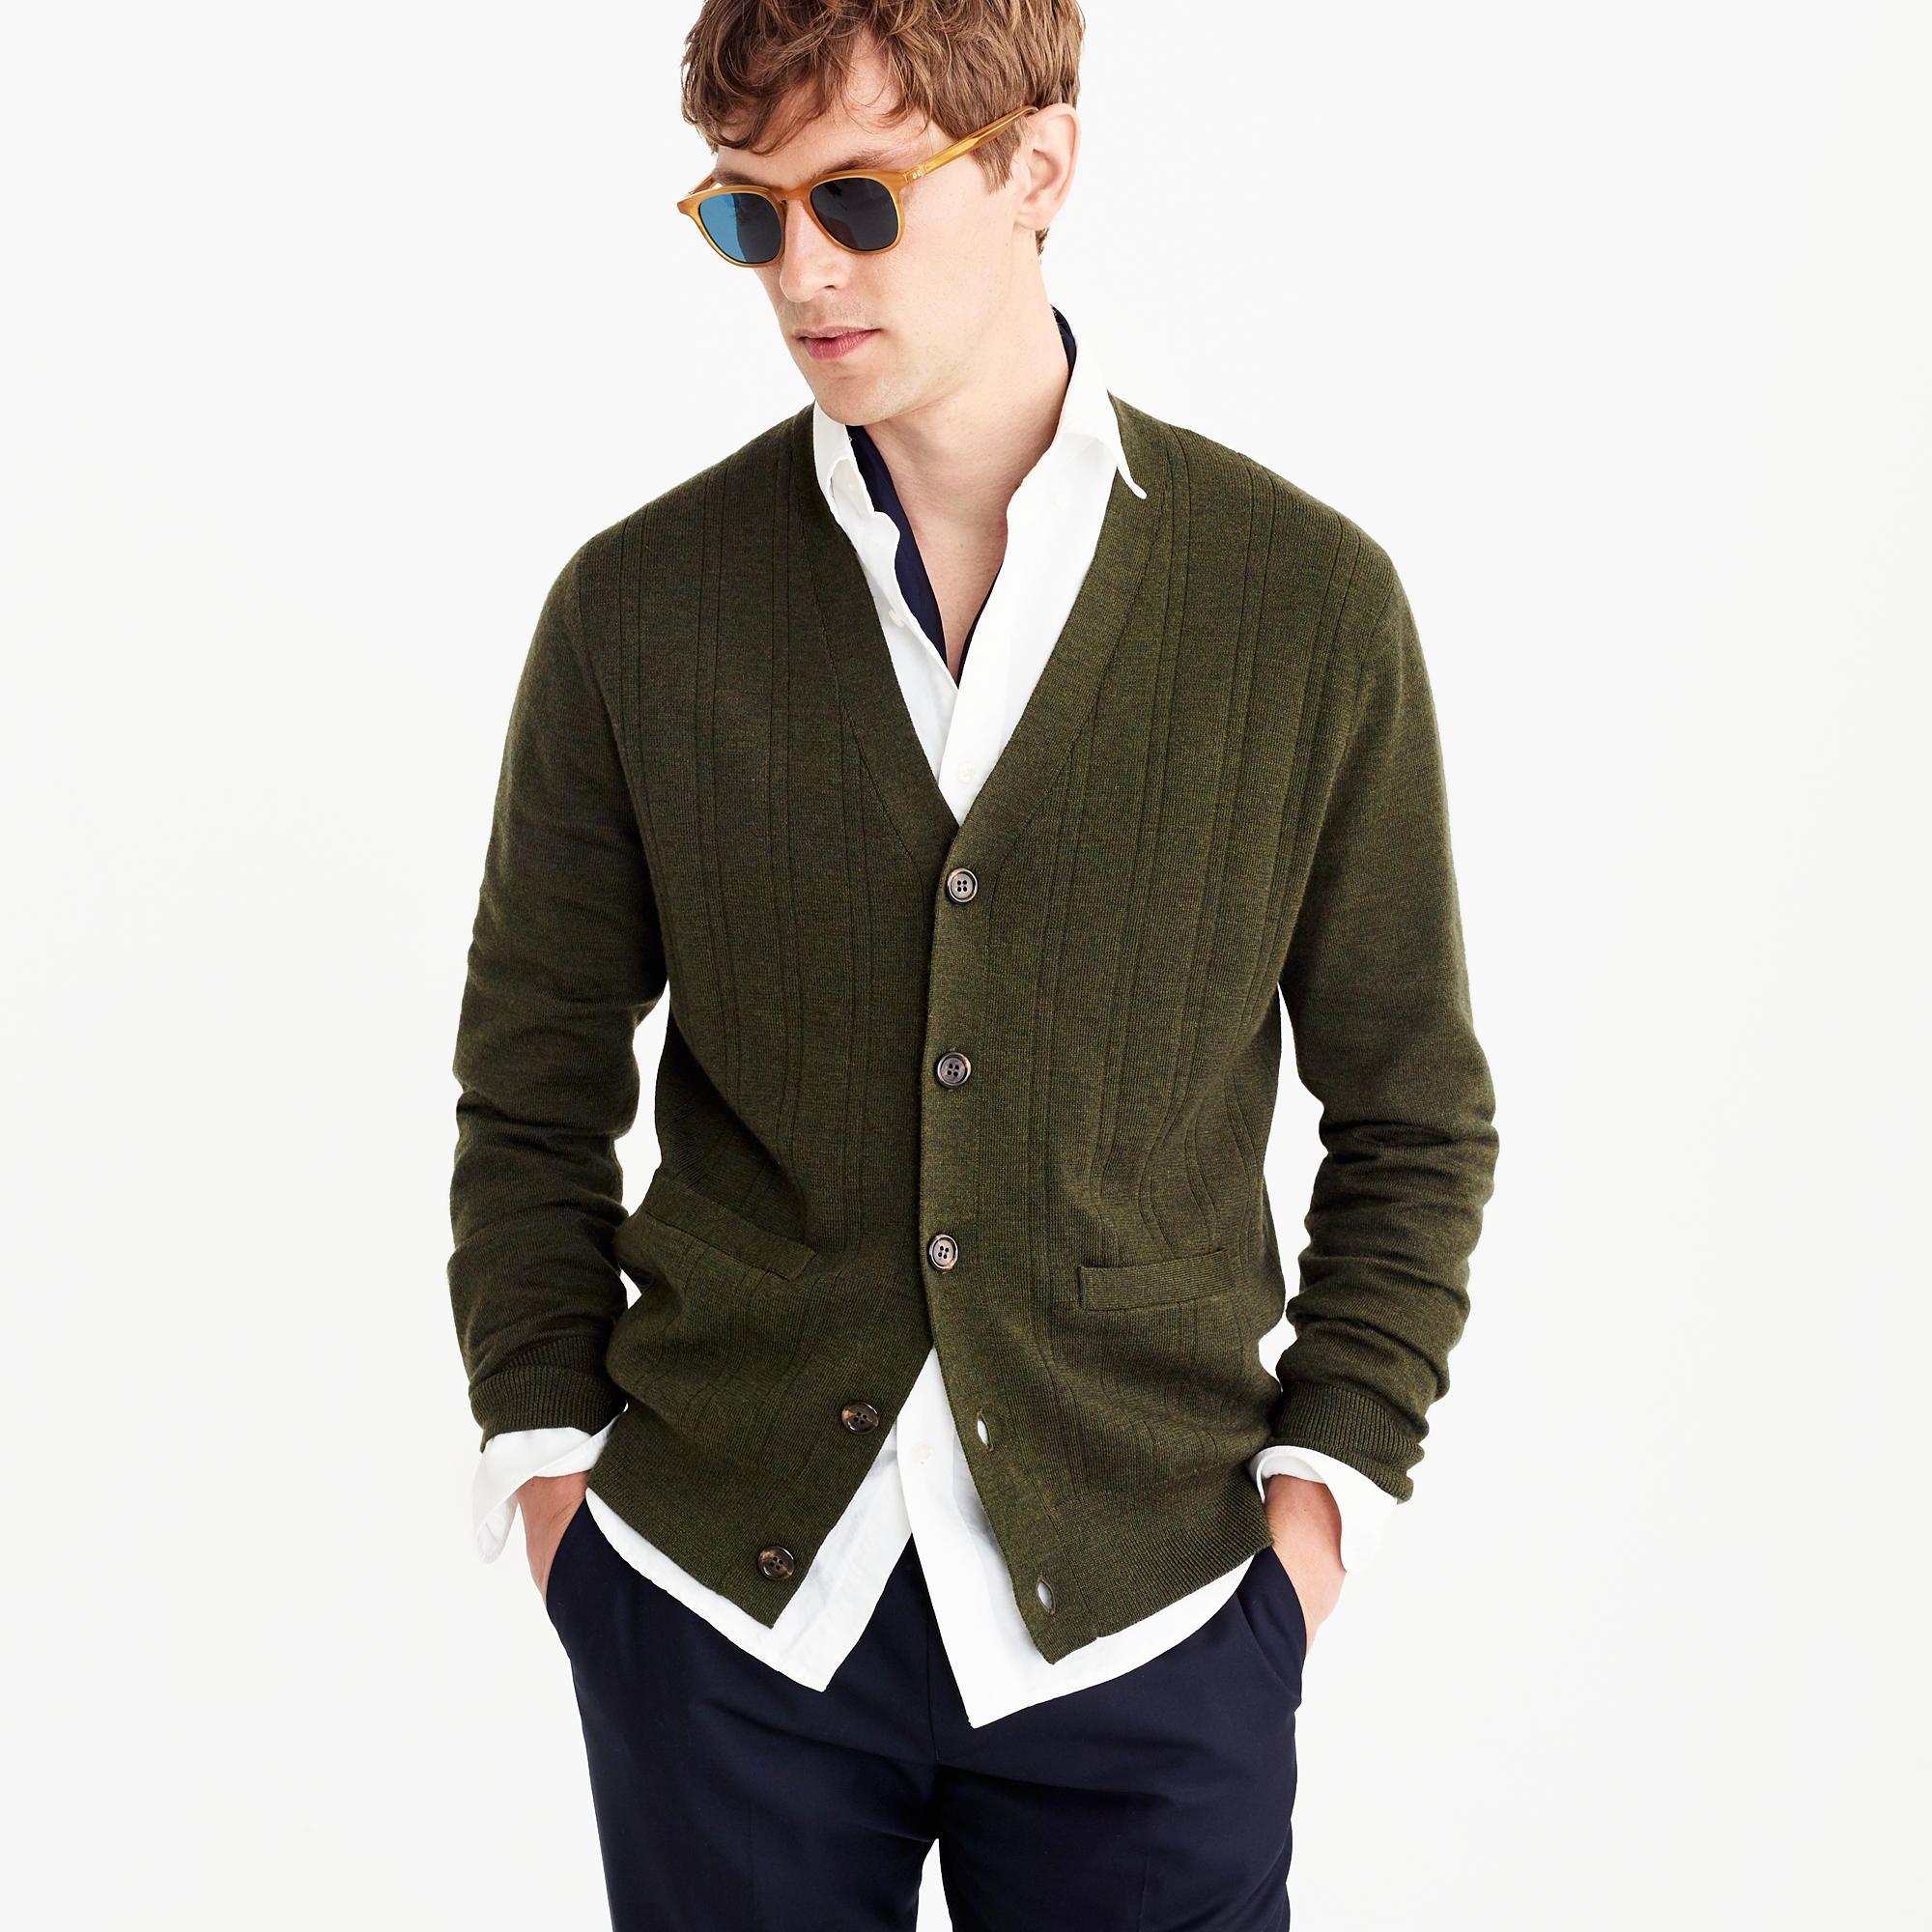 Italian merino wool cardigan sweater in forest green | SS19  ...